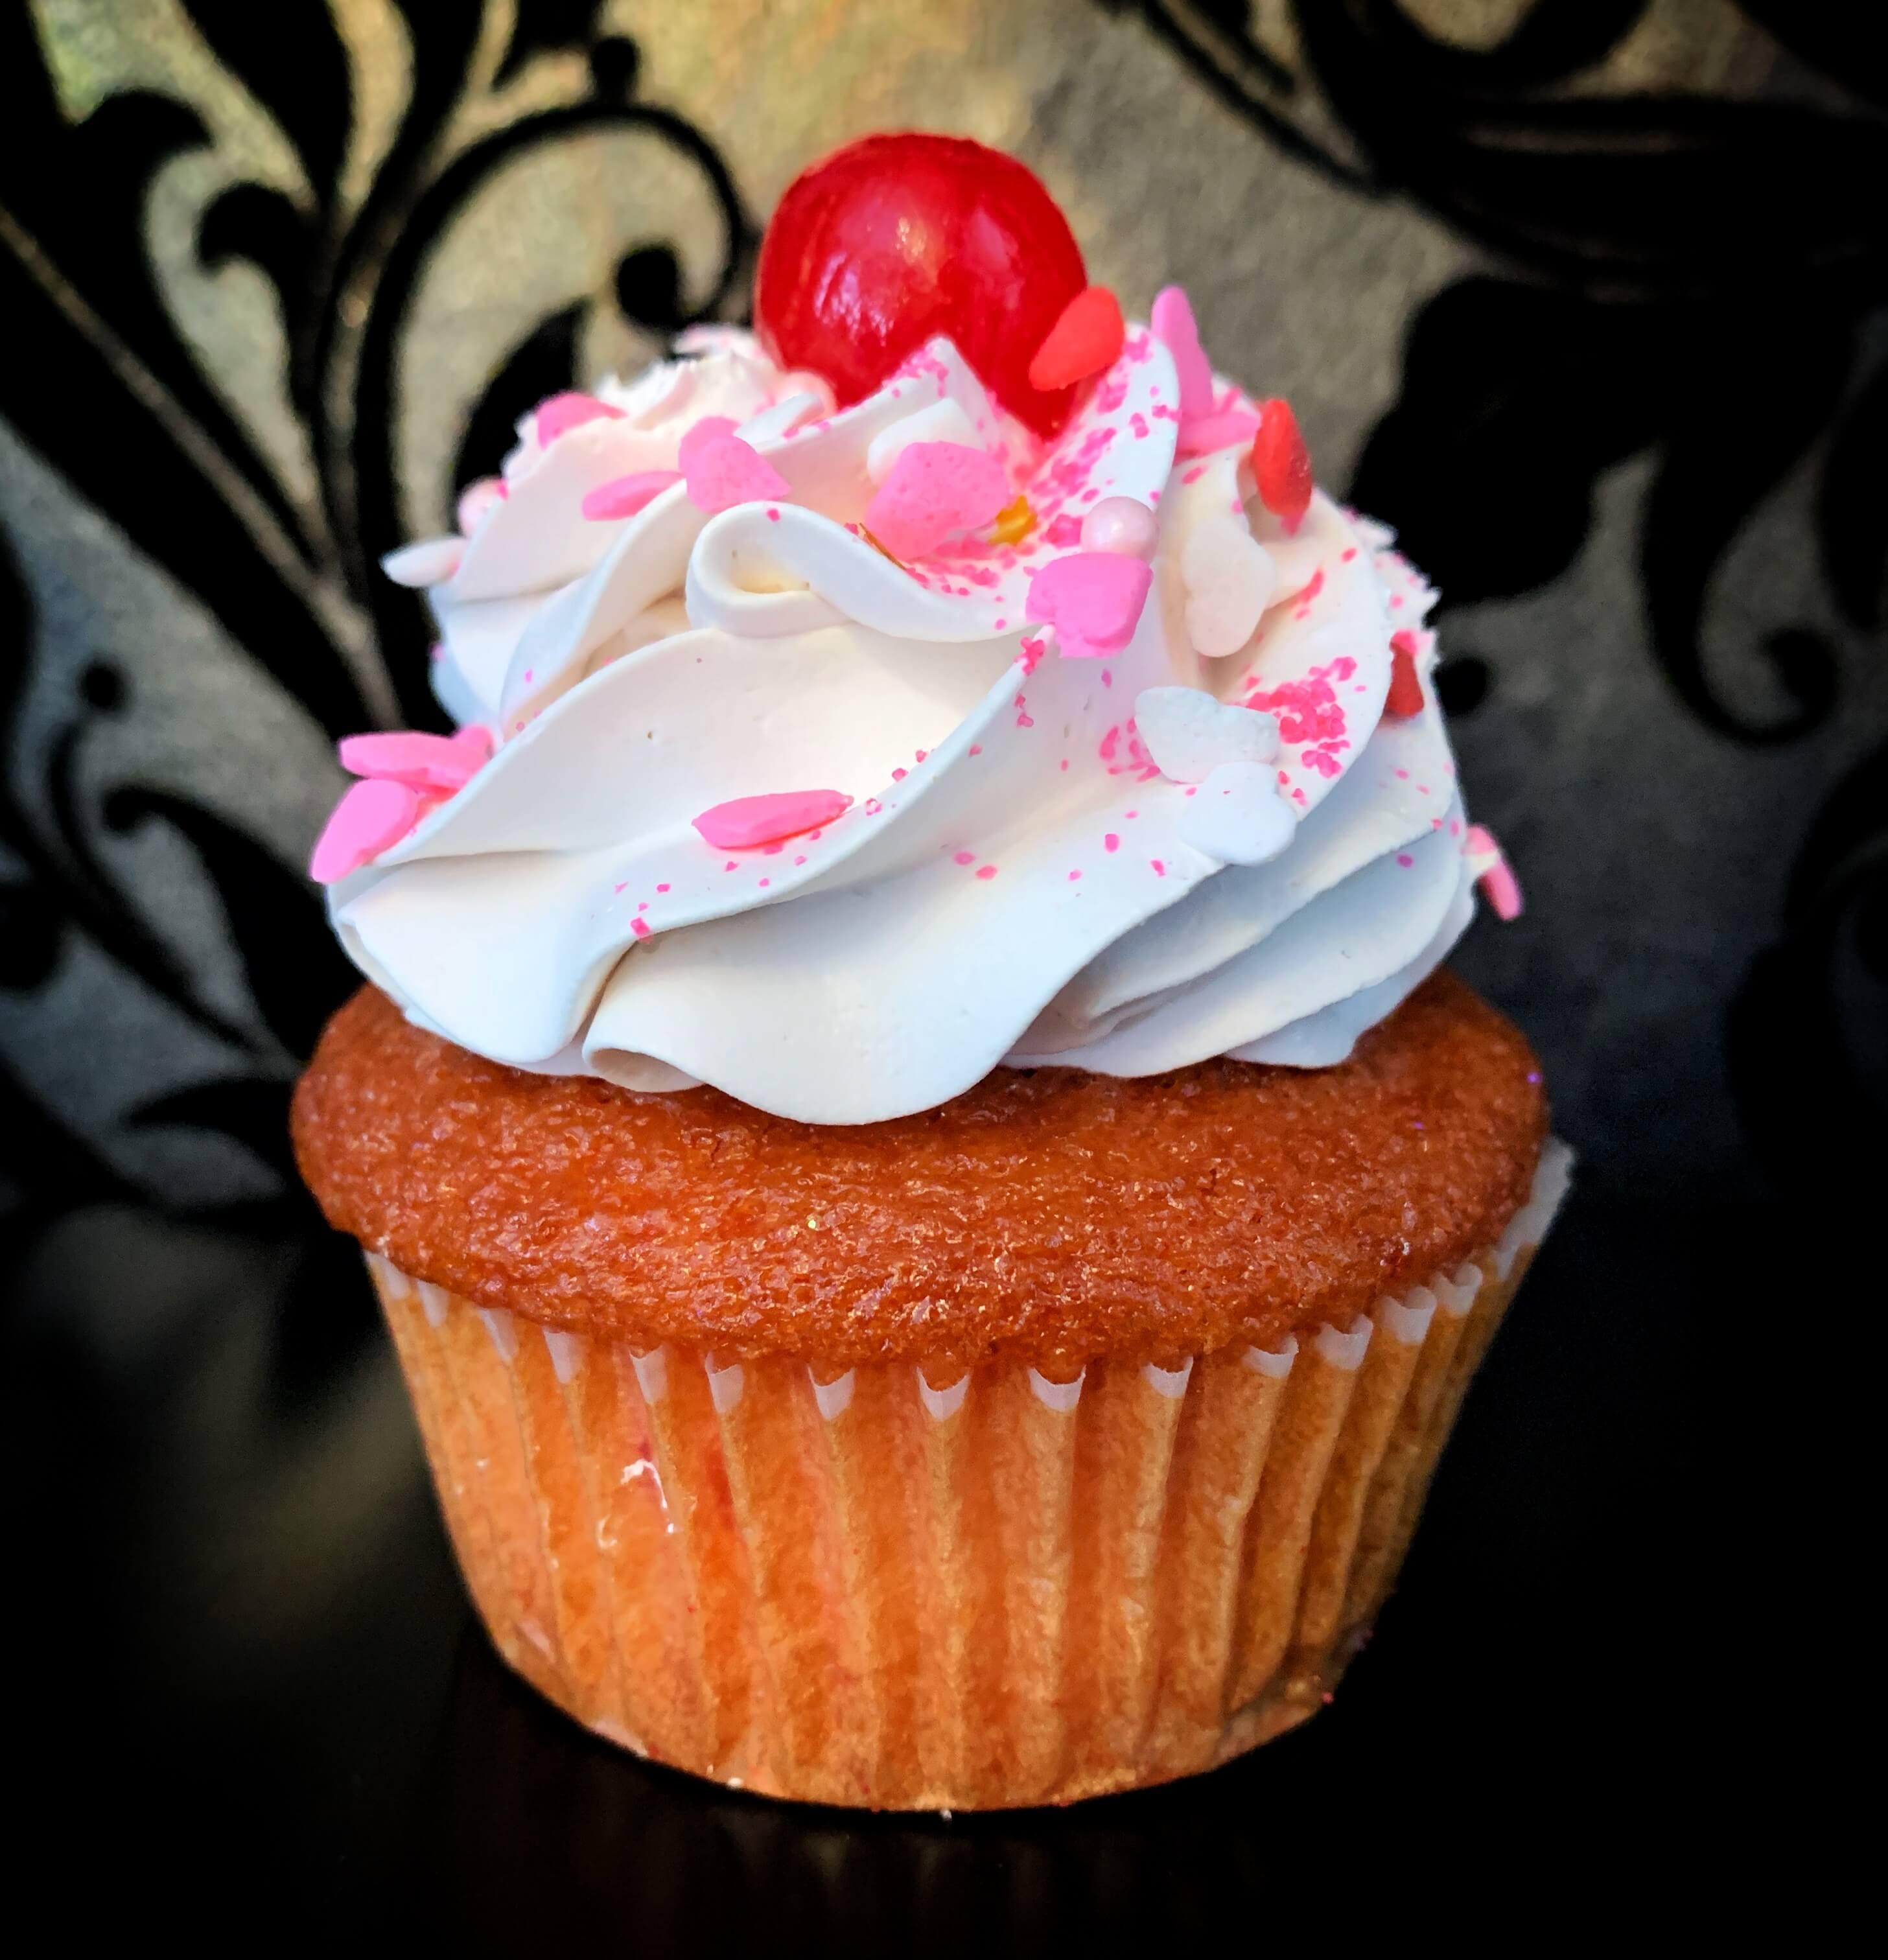 Chastity Cupcake